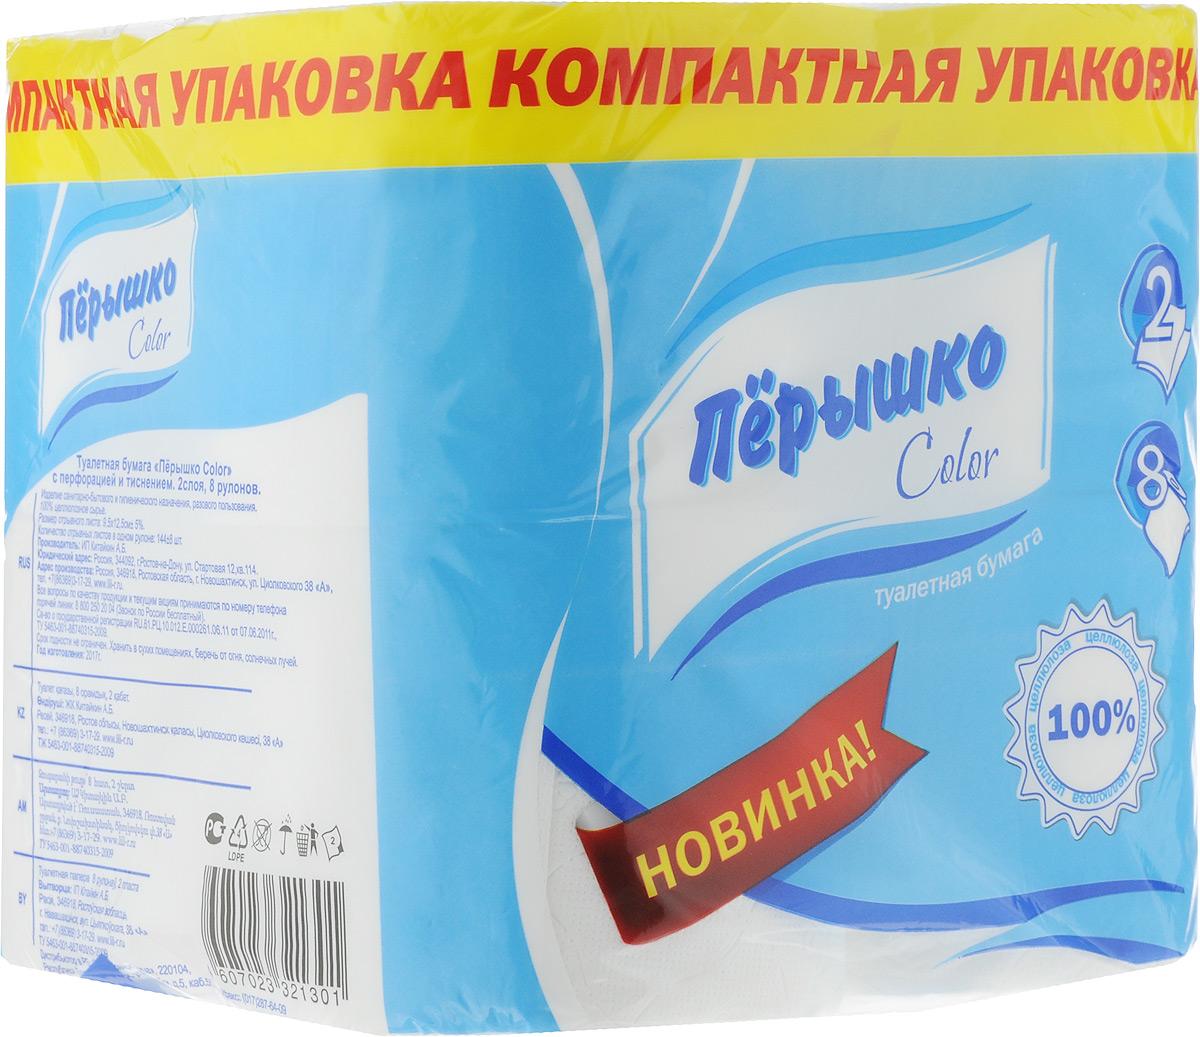 Бумага туалетная Перышко, двухслойная, цвет: белый, 8 рулонов туалетная бумага анекдоты ч 8 мини 815605